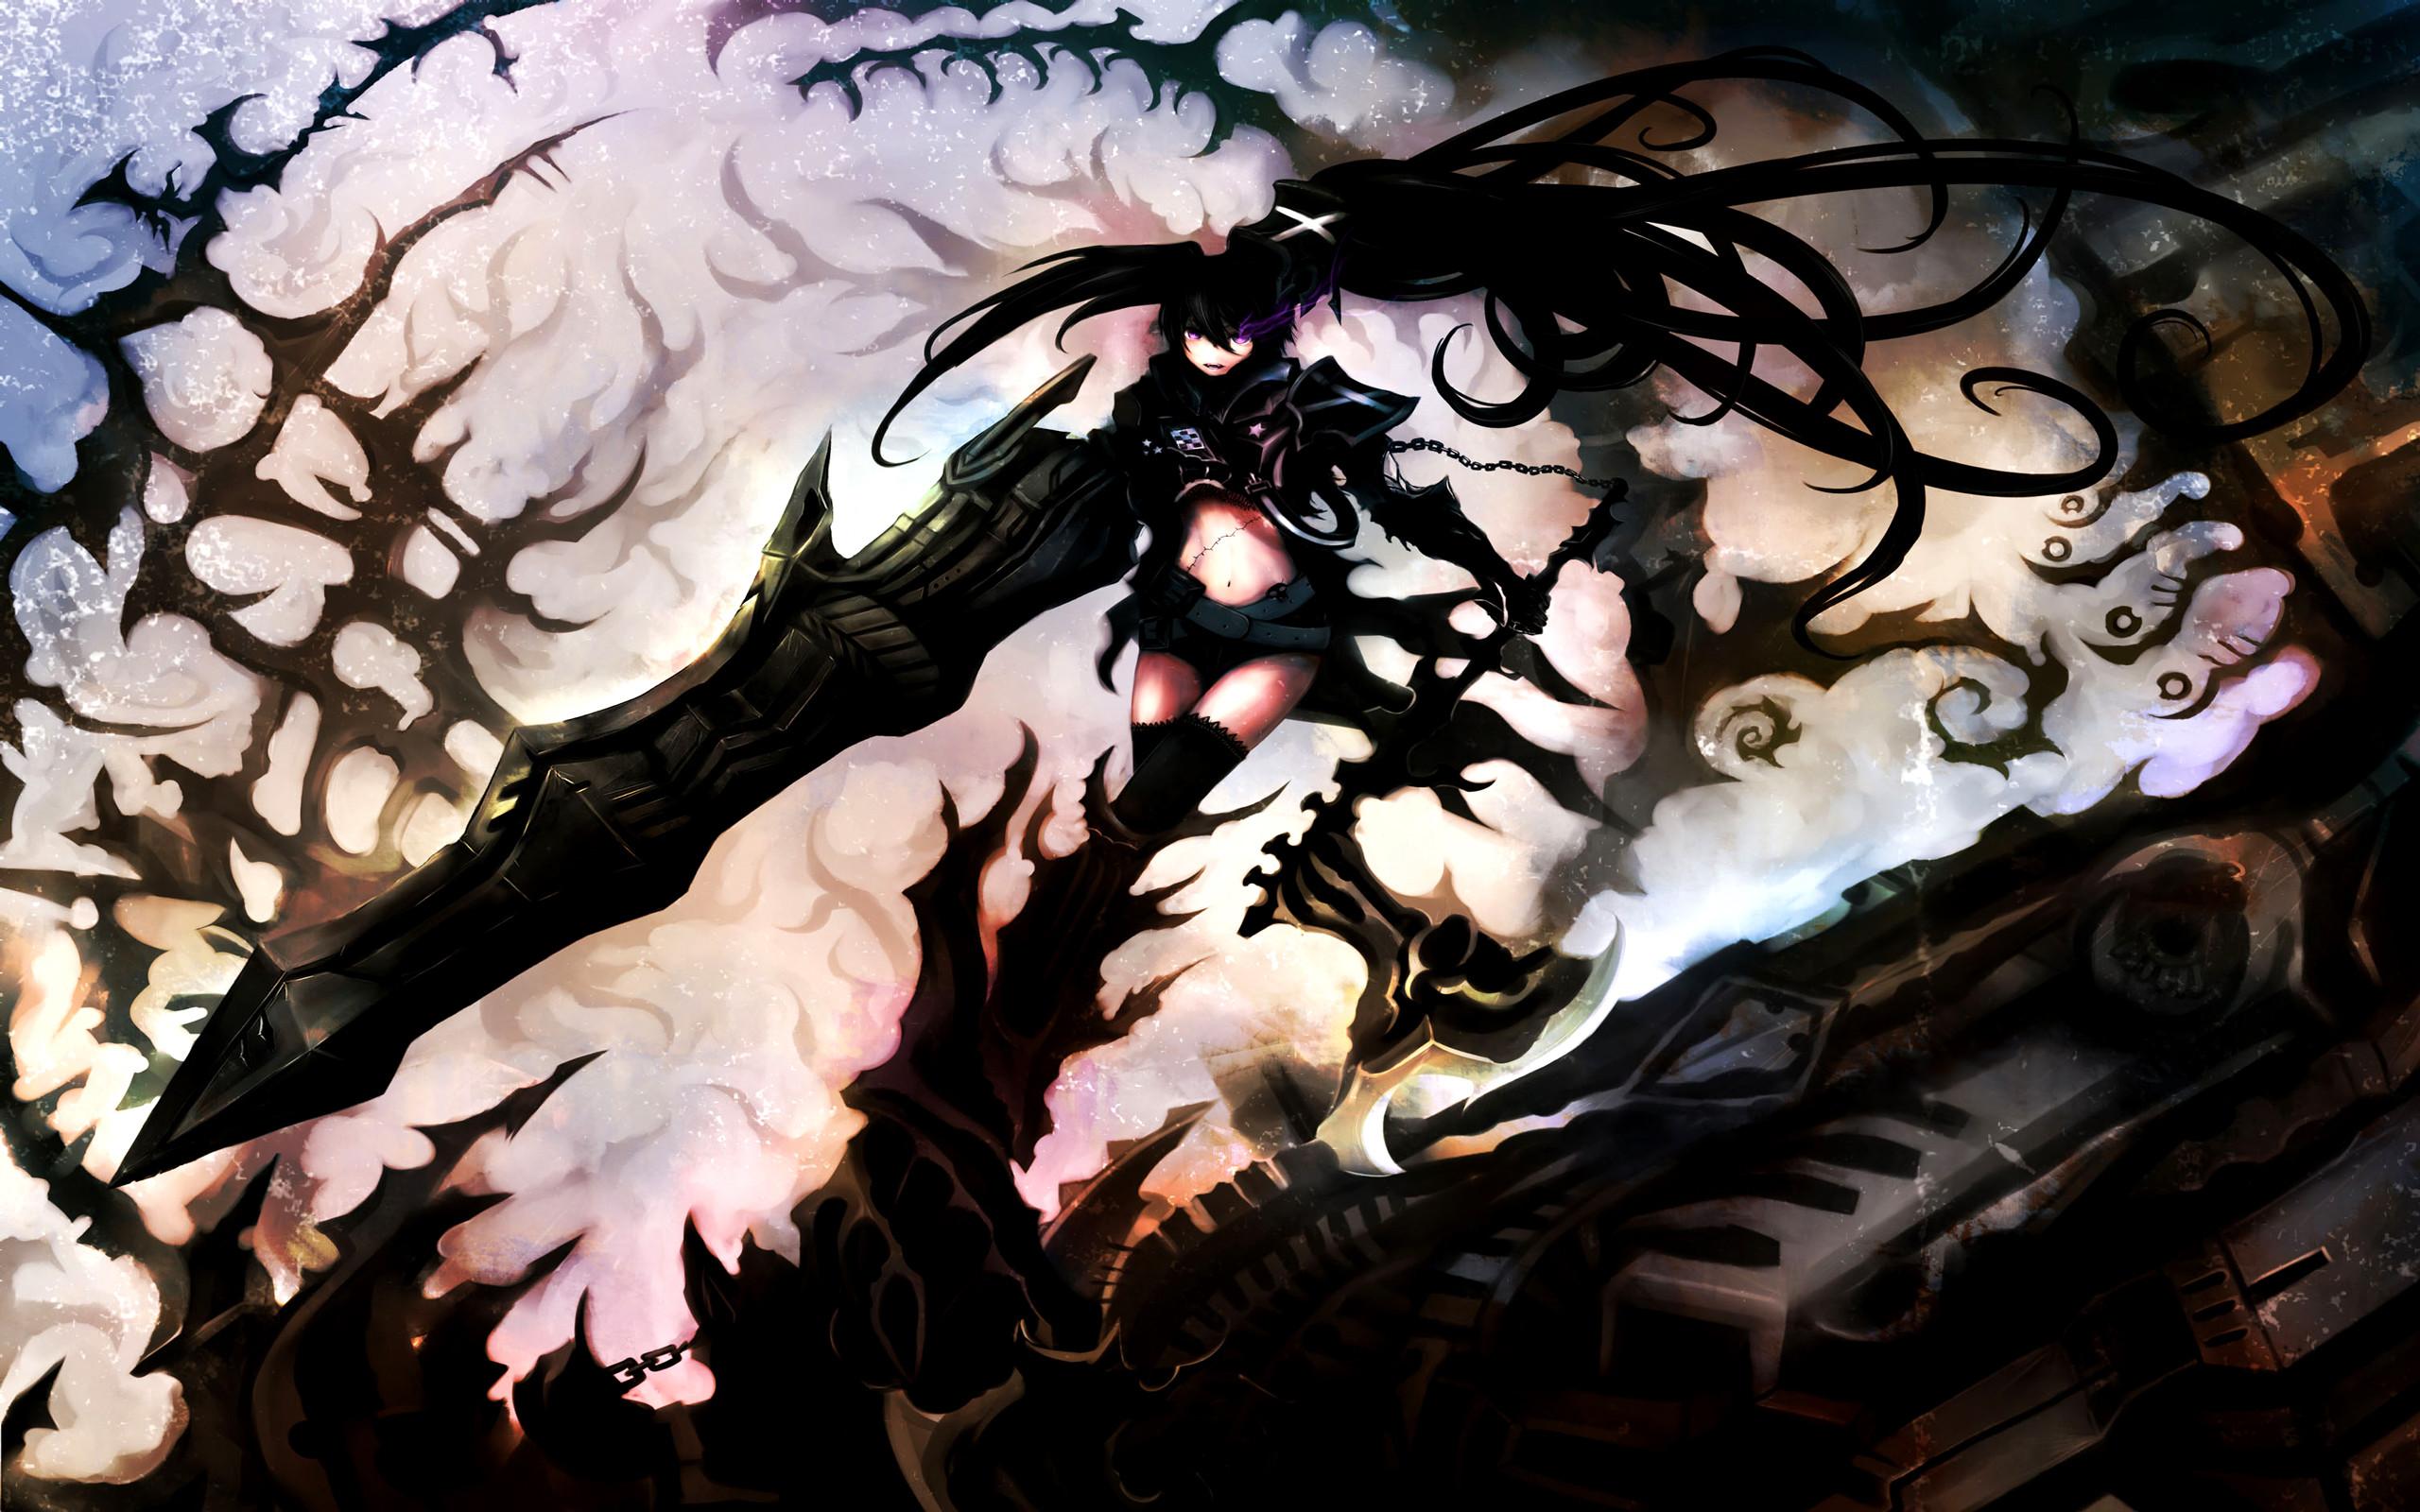 Anime Black Rock Shooter Insane Black Rock Shooter Wallpaper